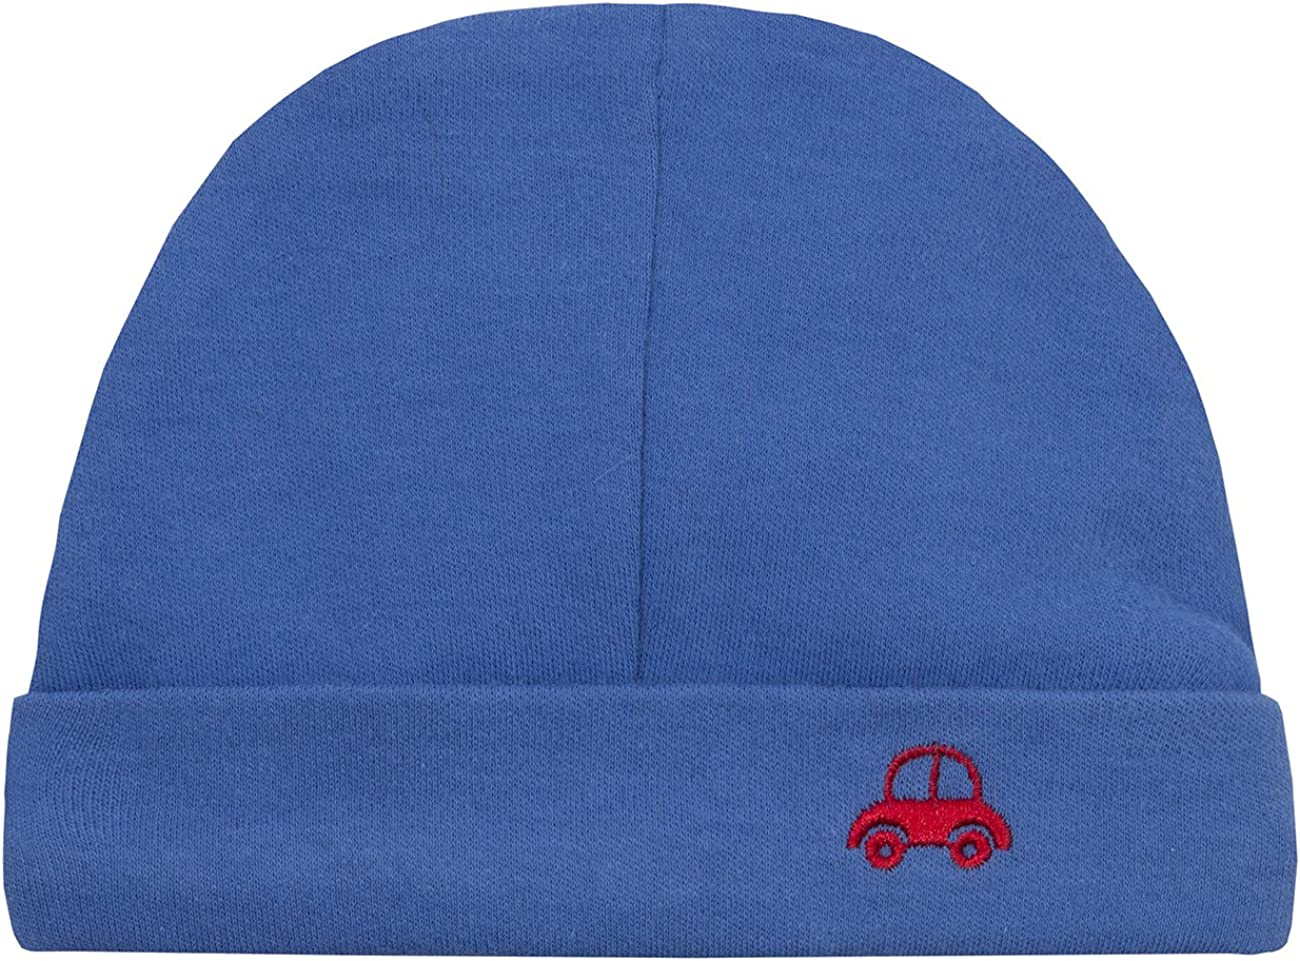 BABY TOWN Baby Boys Cars Sleepsuit Set 2 Piece Babygrow Cradle Cap Bundle